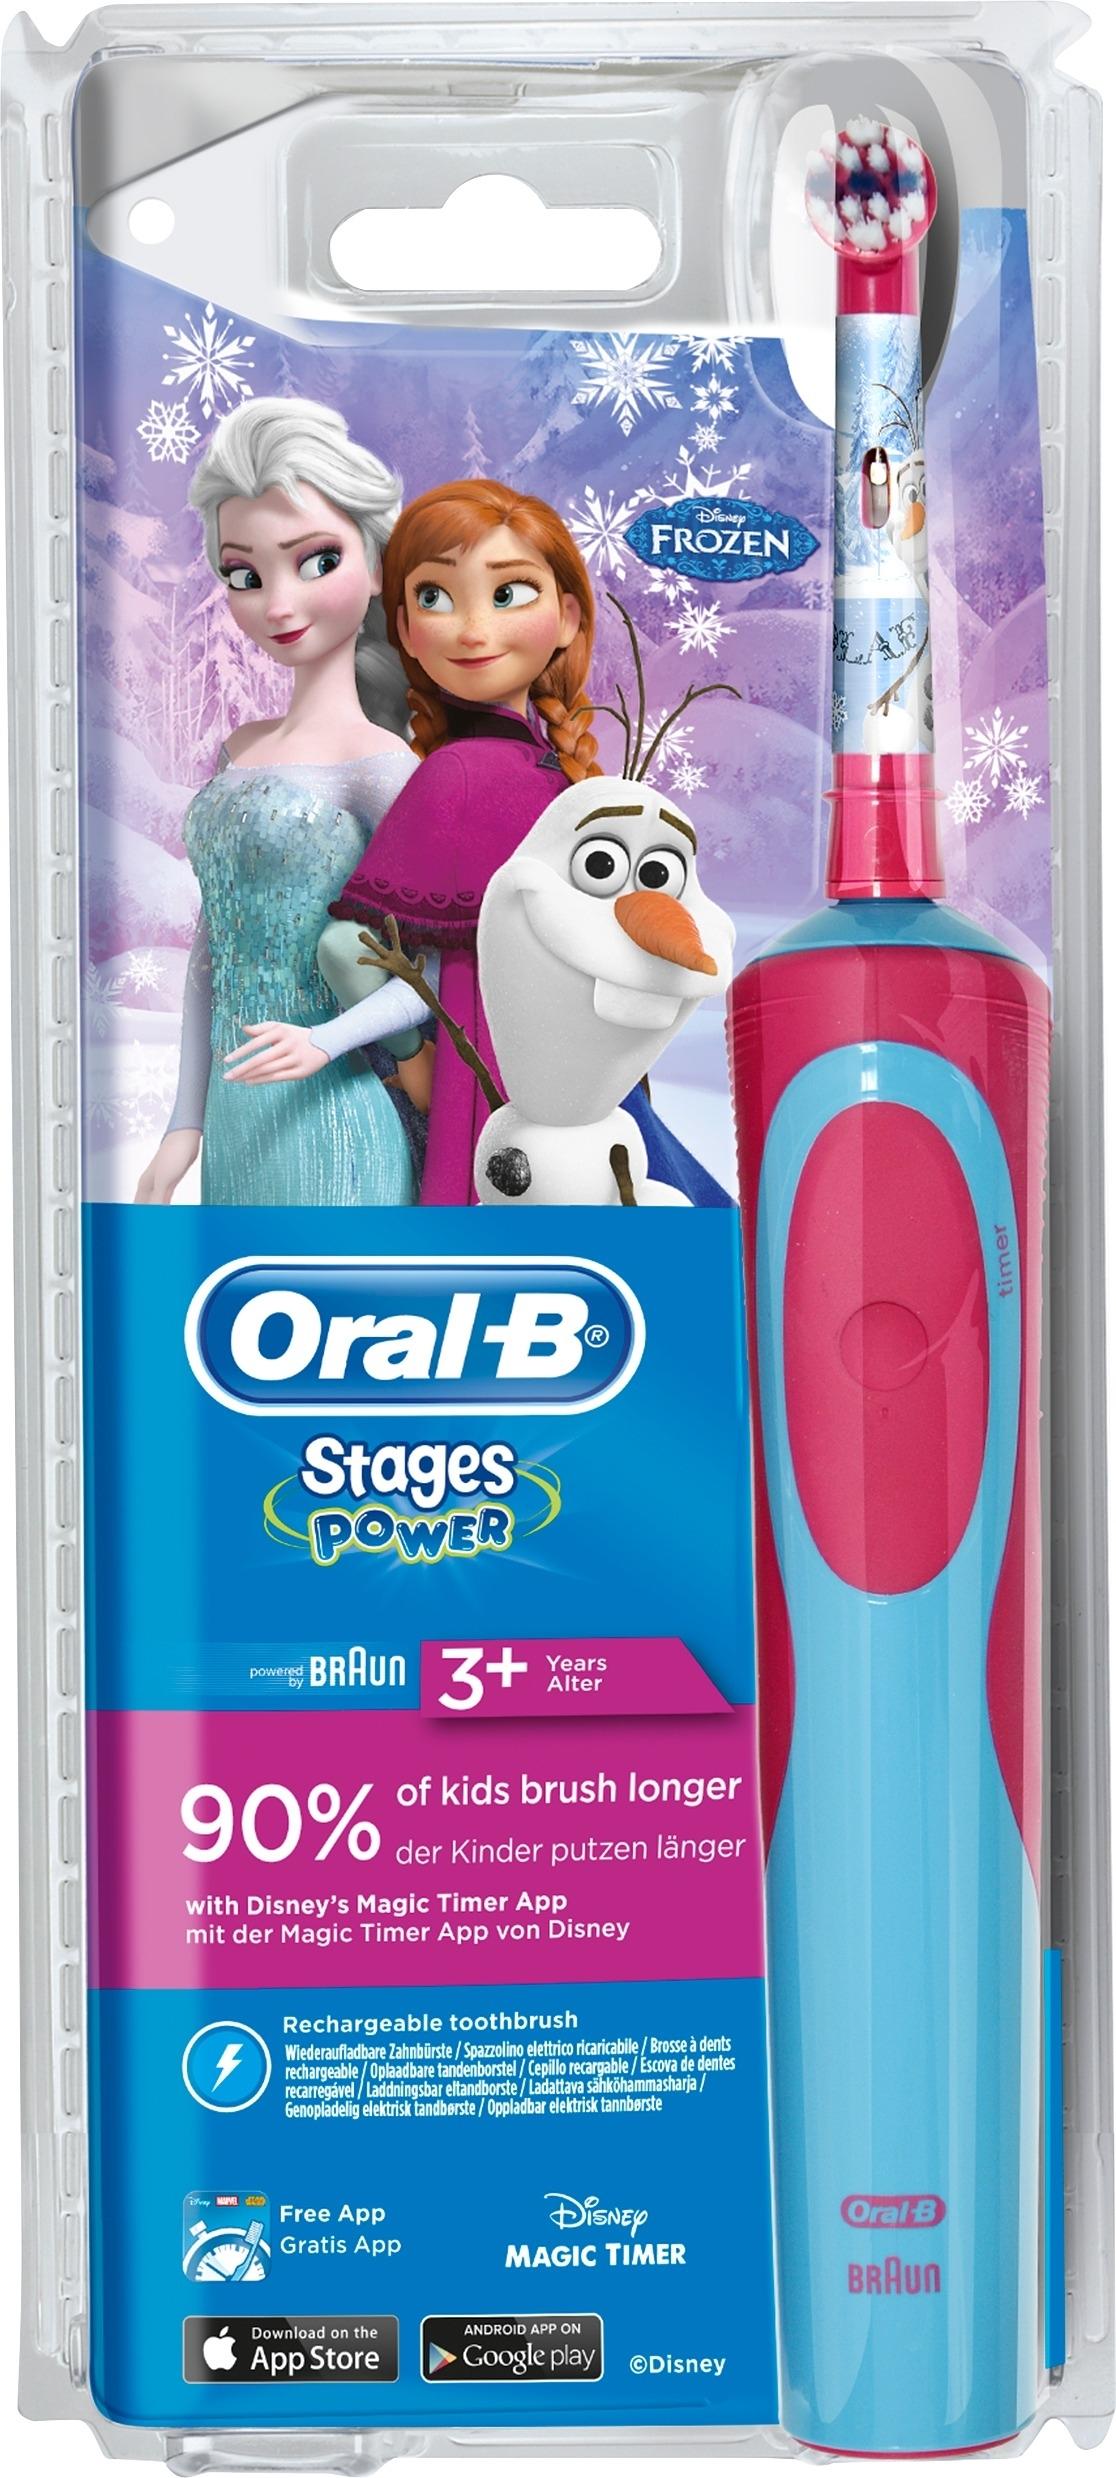 Oral-B Stages Power Frozen Eltandborste 3 år+ - Apotek Hjärtat 4954eaa0dec8c